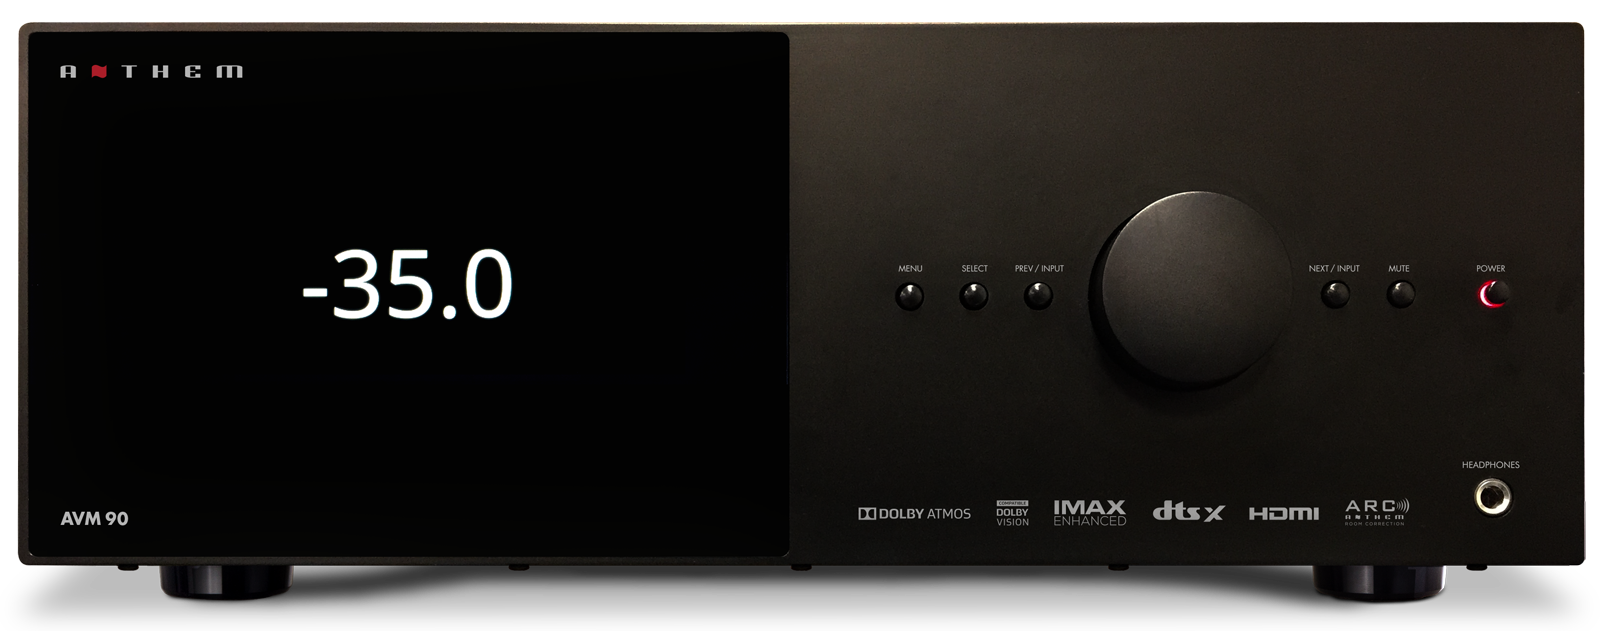 Processeur cinéma Anthem AVM90